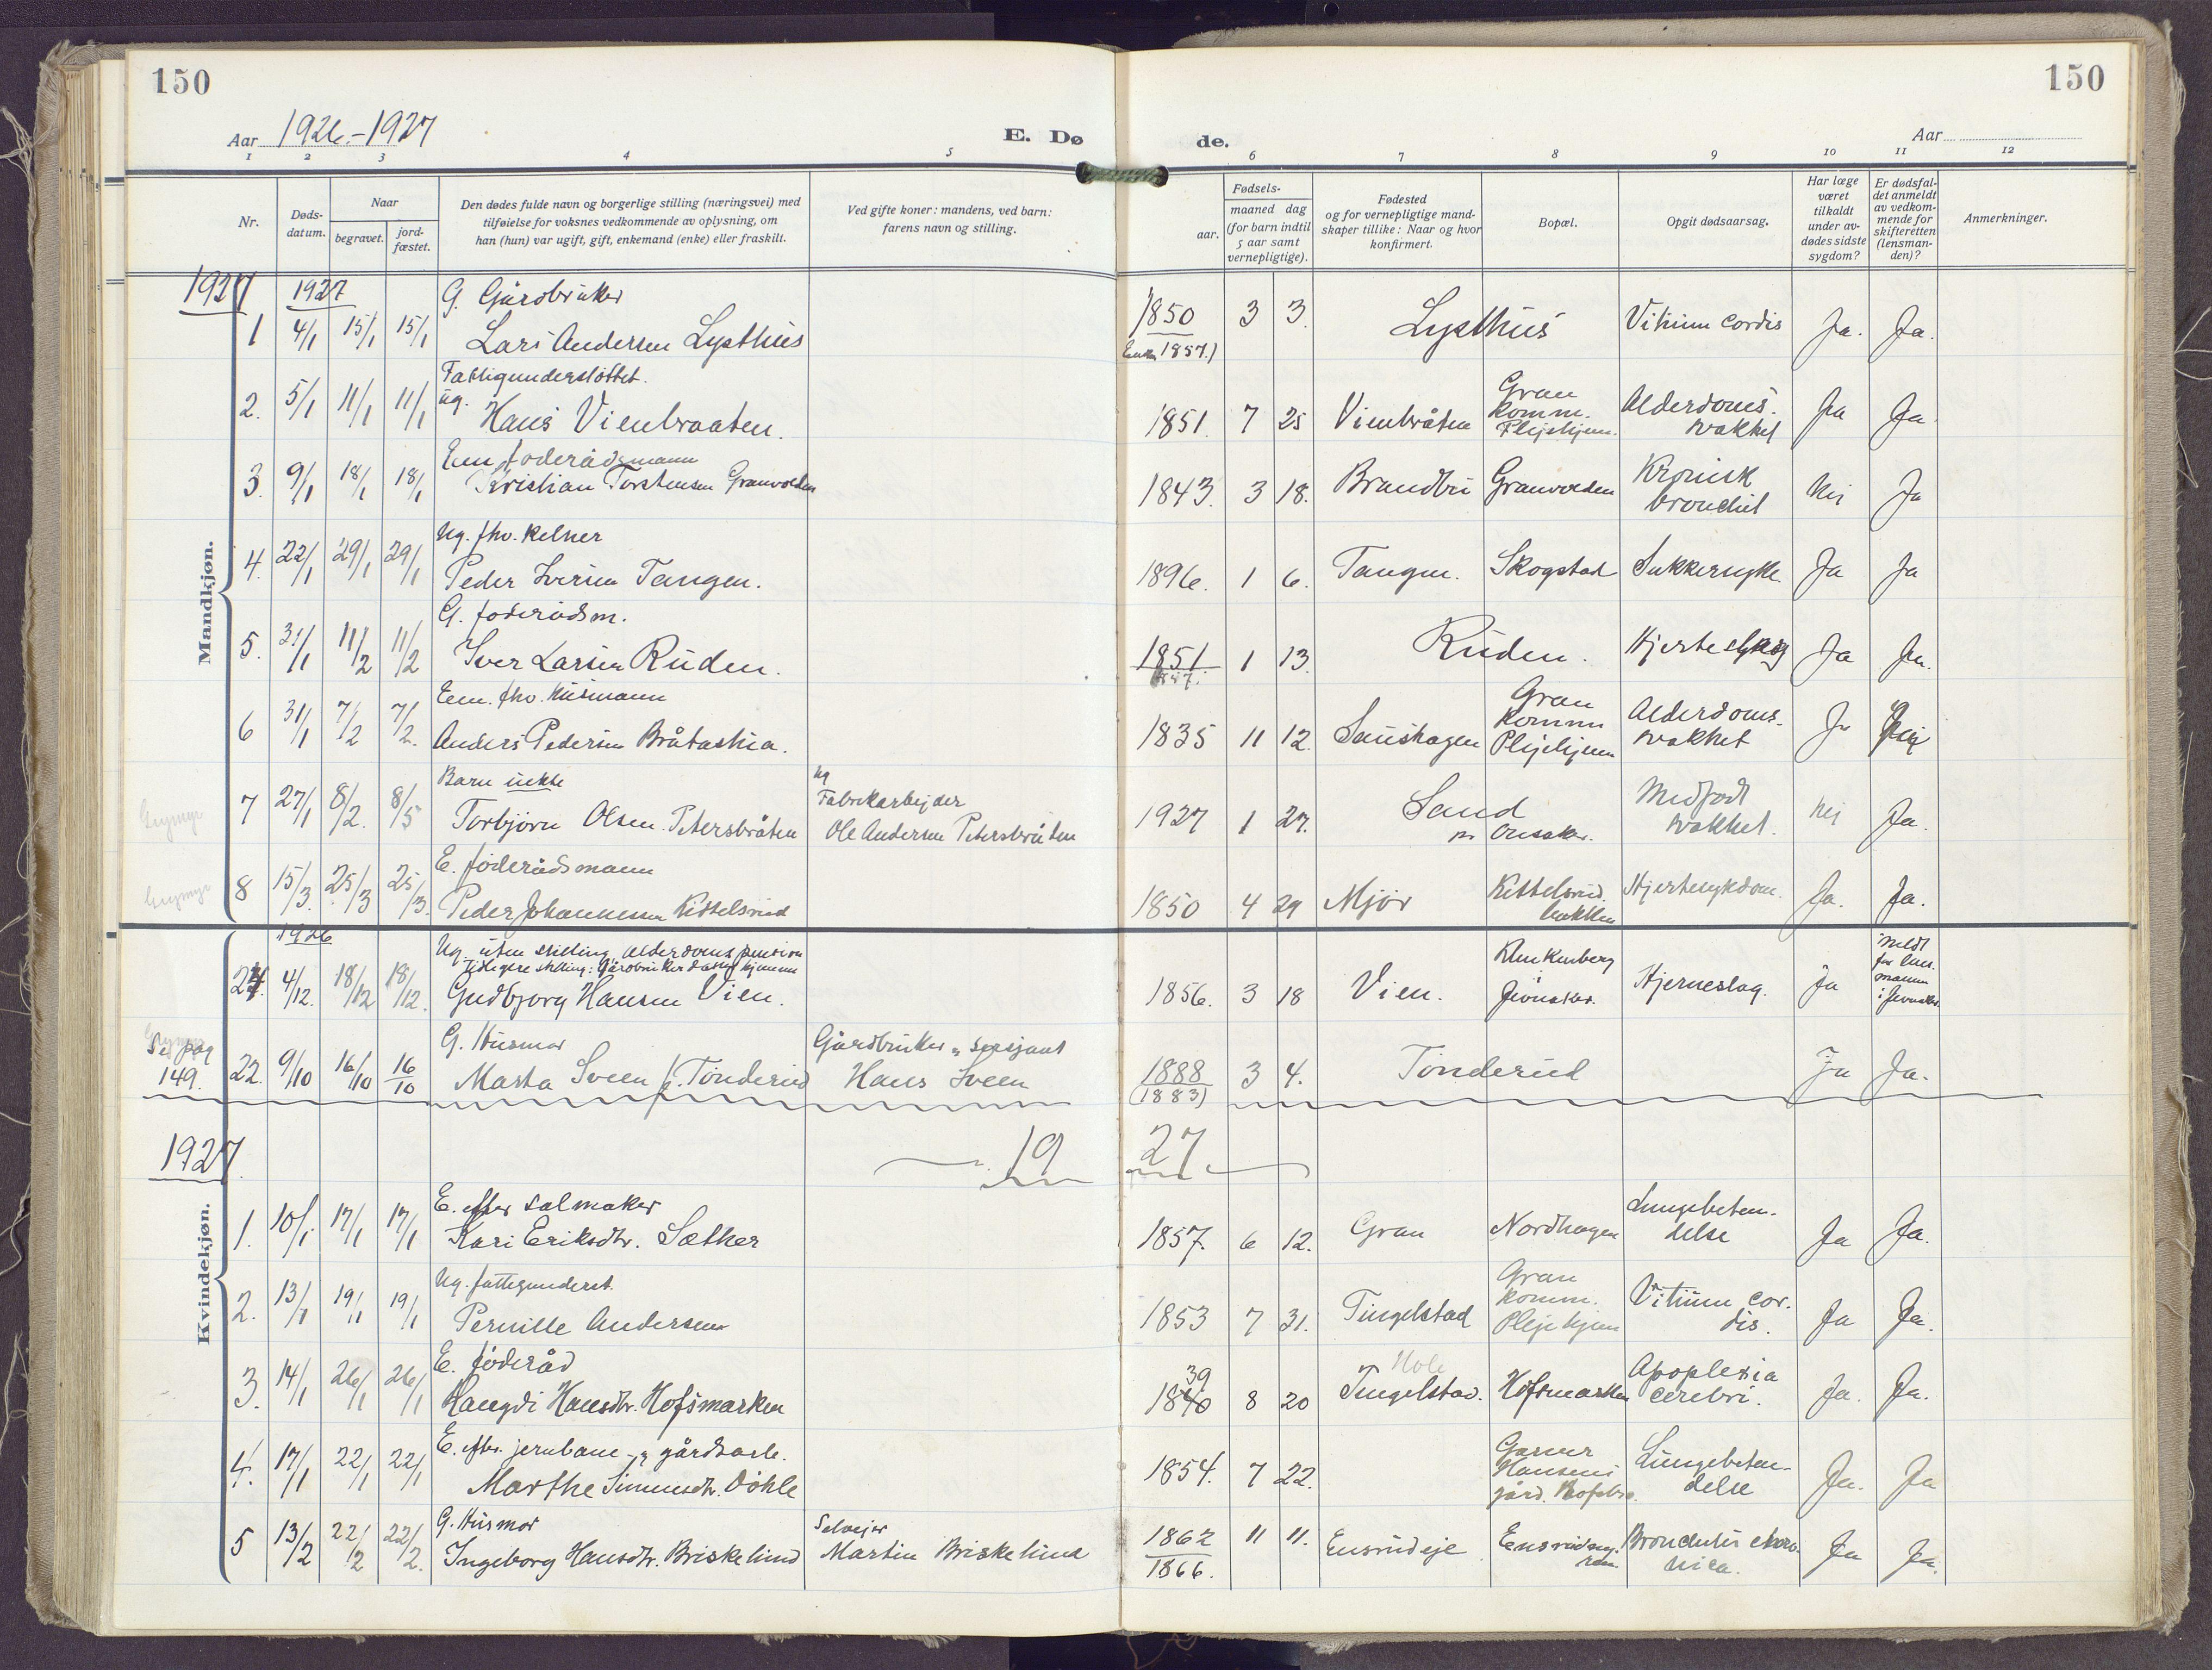 SAH, Gran prestekontor, Ministerialbok nr. 23, 1919-1938, s. 150